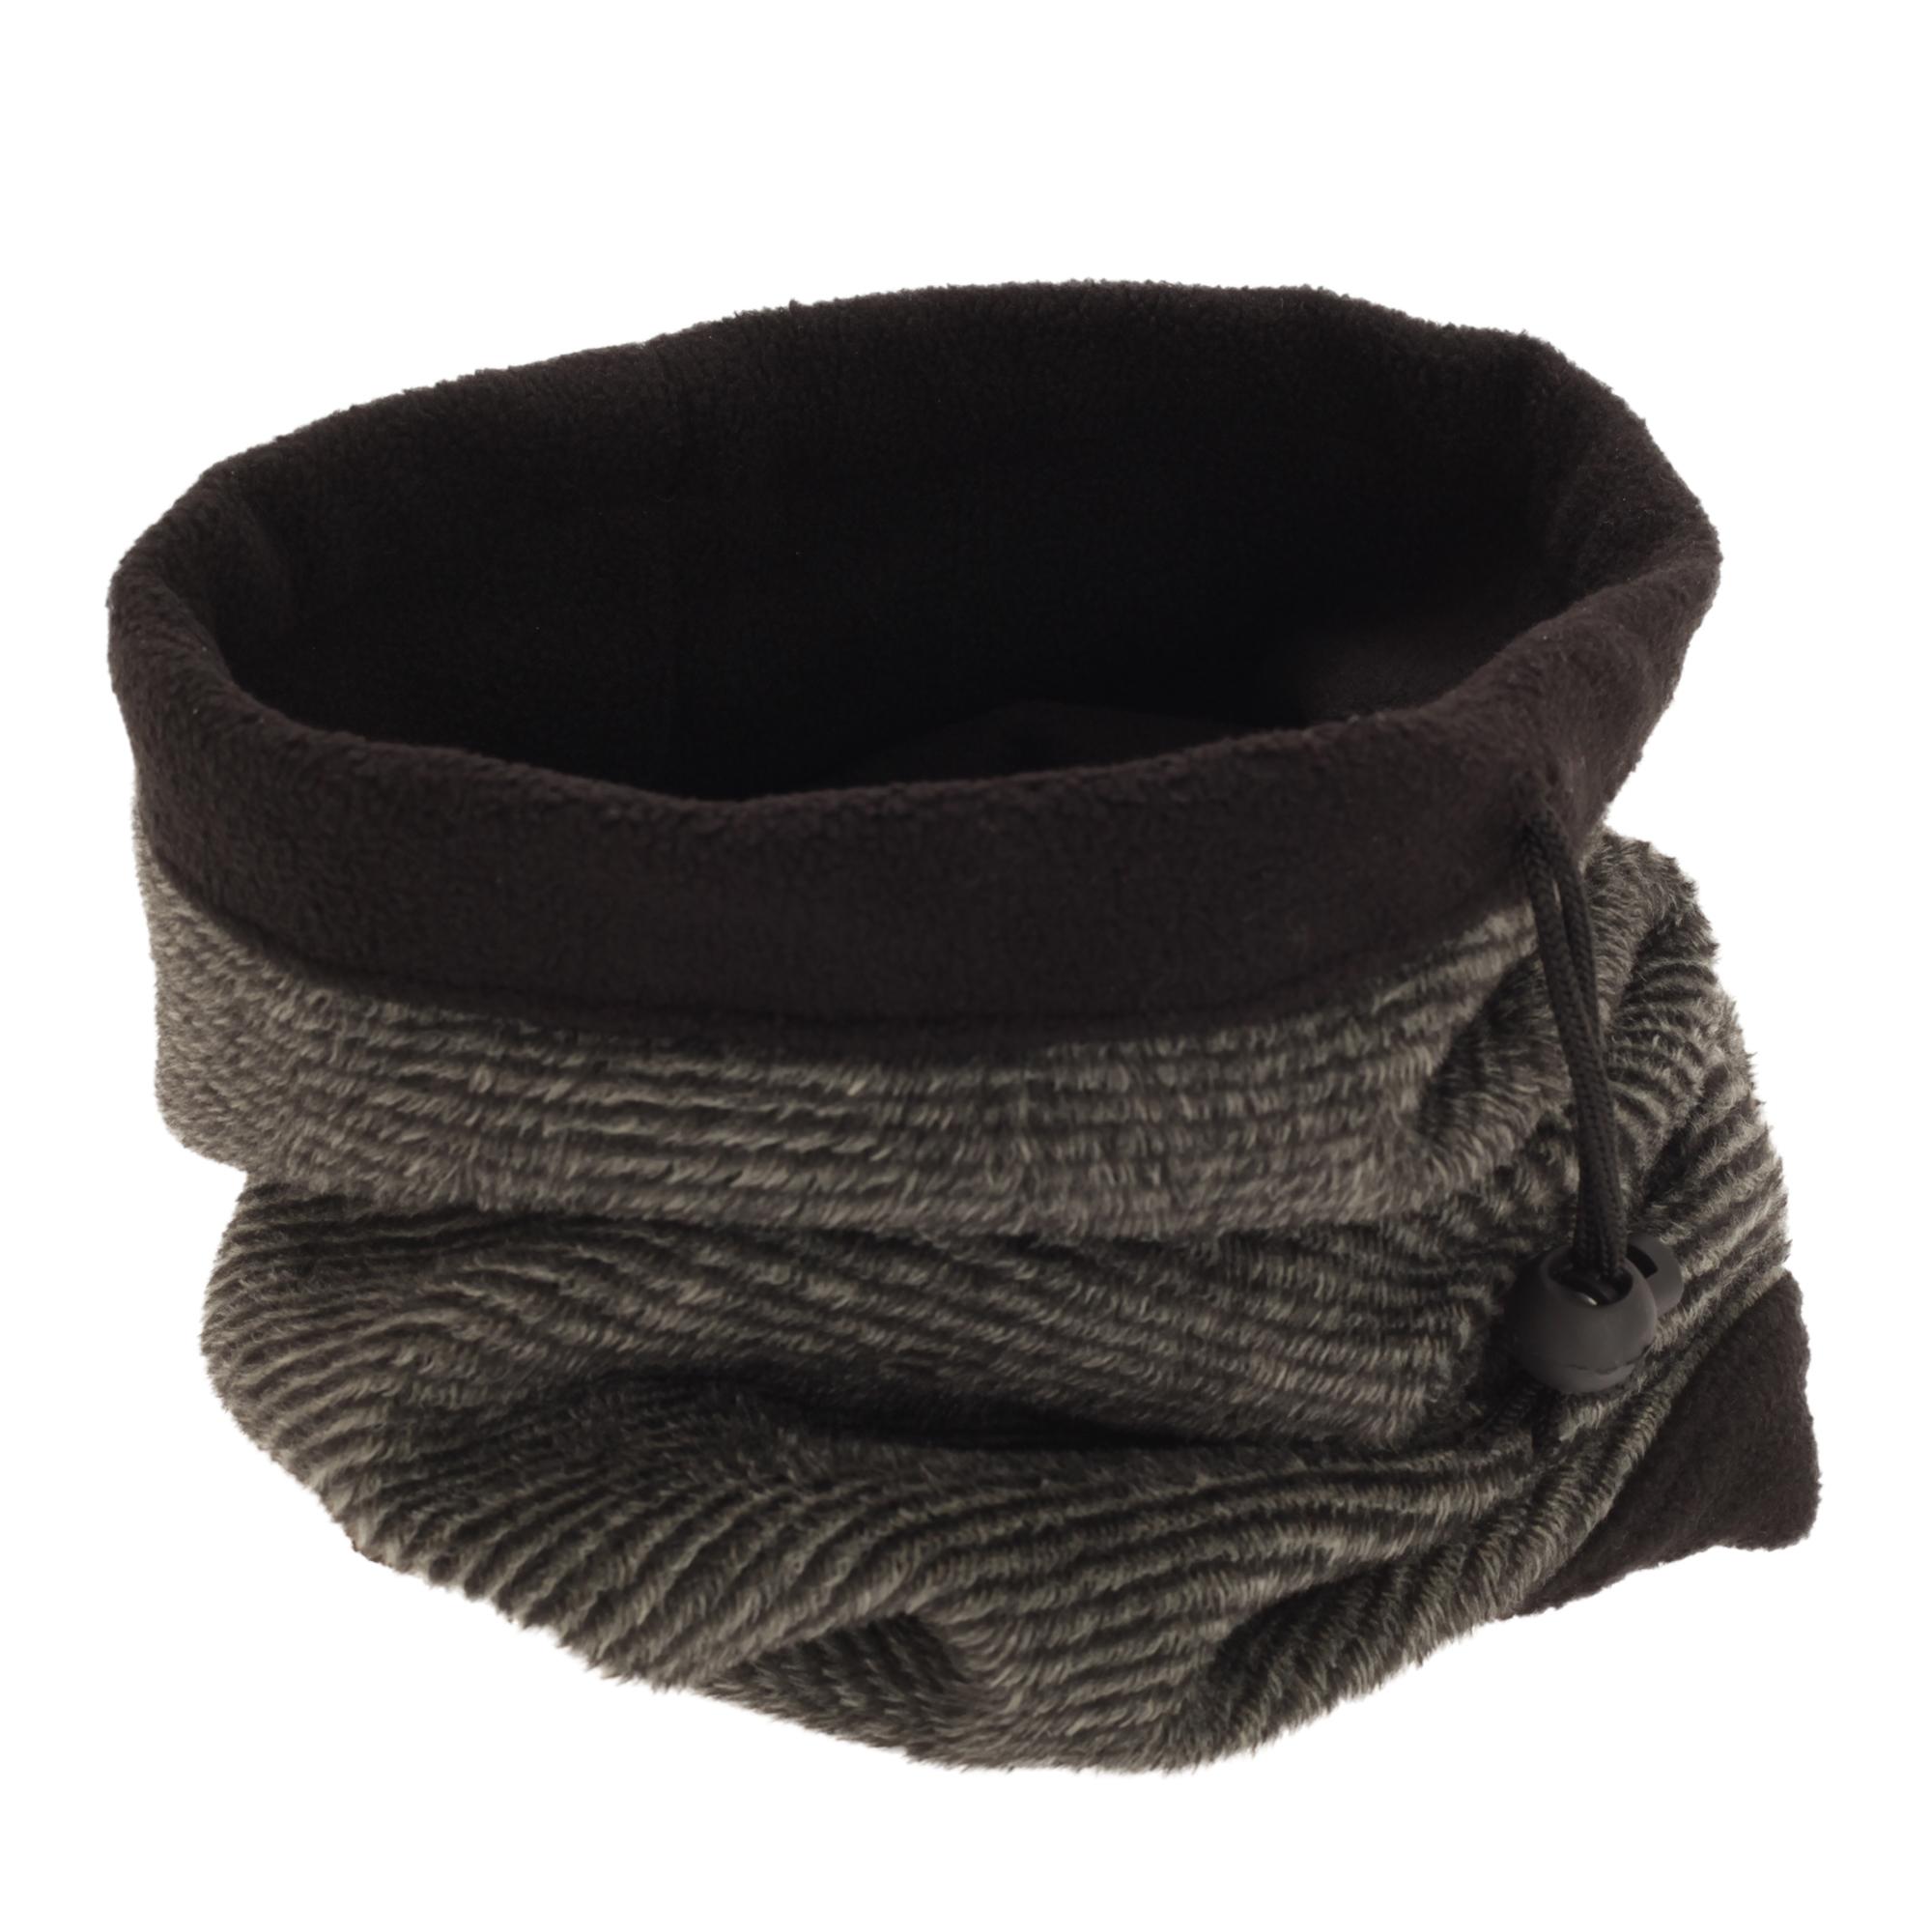 FLOSO Womens/Ladies Multipurpose Fleece Neckwarmer Snood / Hat (One Size) (Graphite)